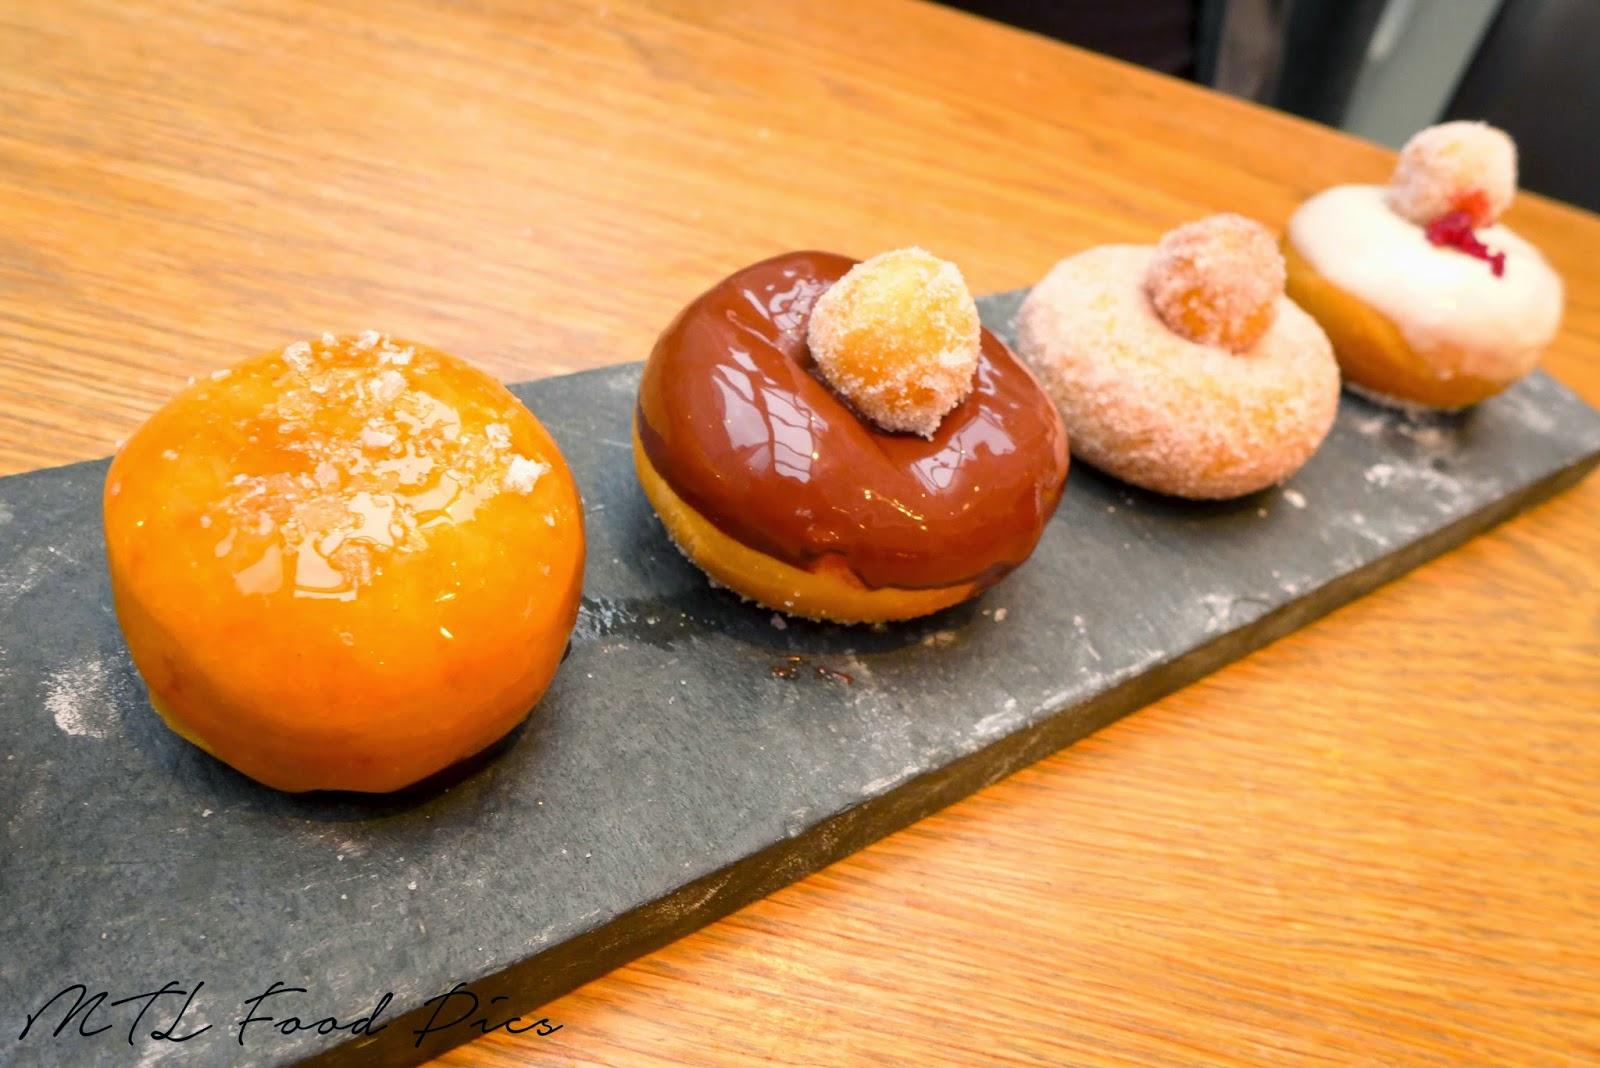 Apple Maple-Caramel, Dark Chocolate, White Chocolate-Cranberry, Cinnamon-Sugar Doughnuts